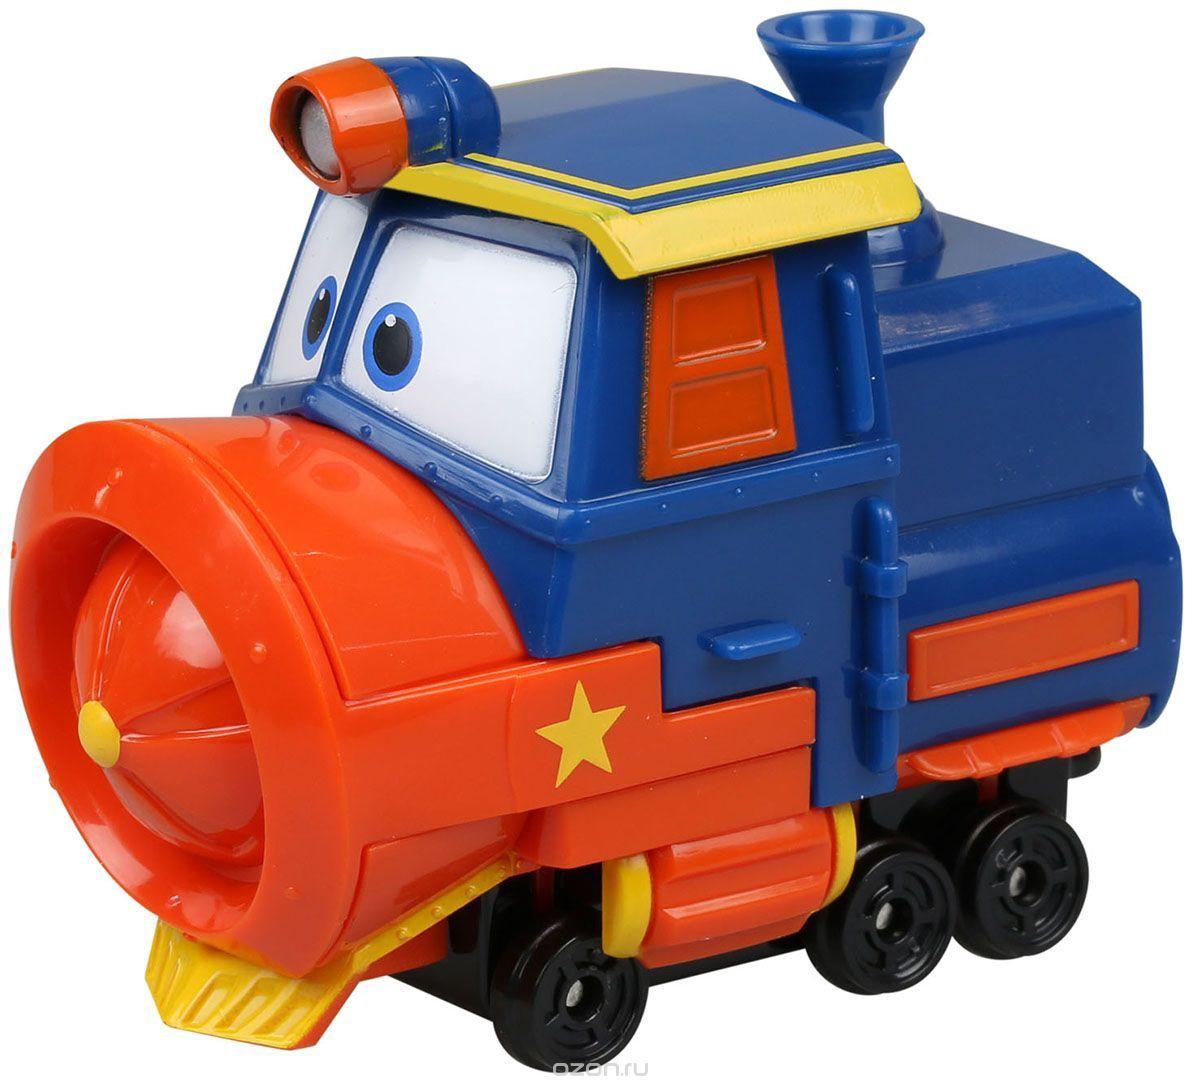 ROBOT TRAINS VEHICLE VICTOR